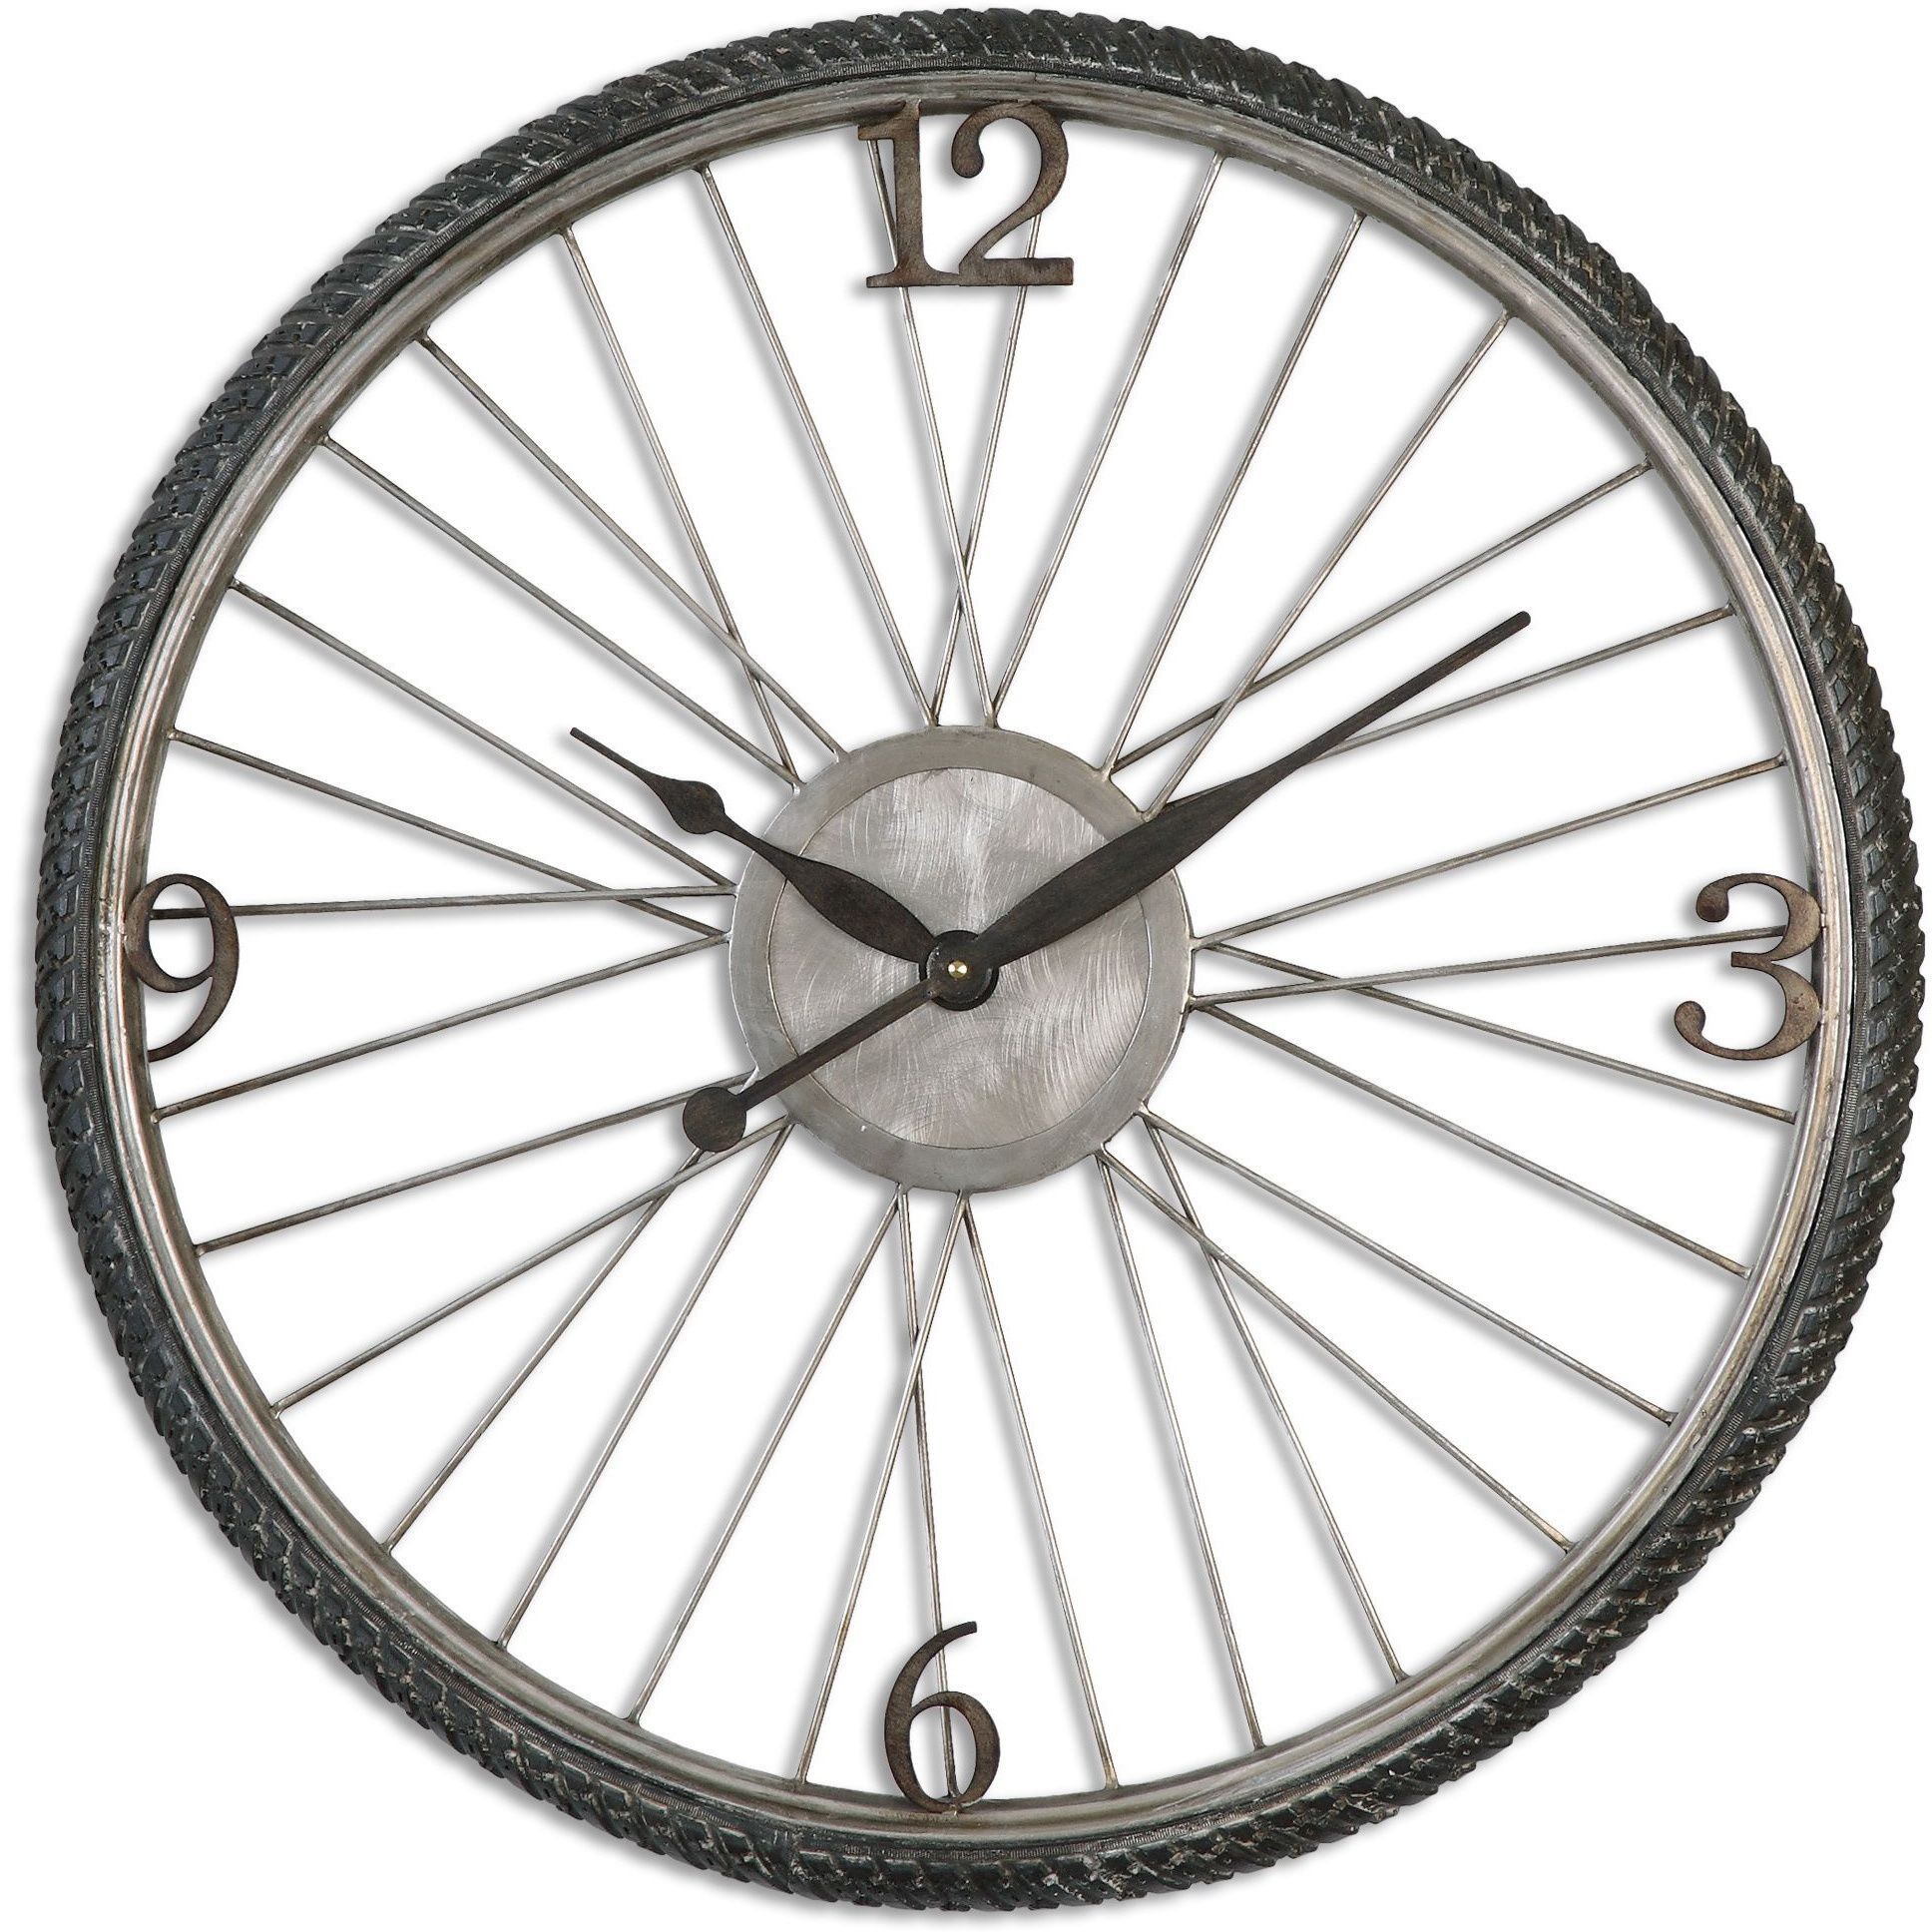 Uttermost Spokes Antiqued Wall Clock Spokes Wall Clock